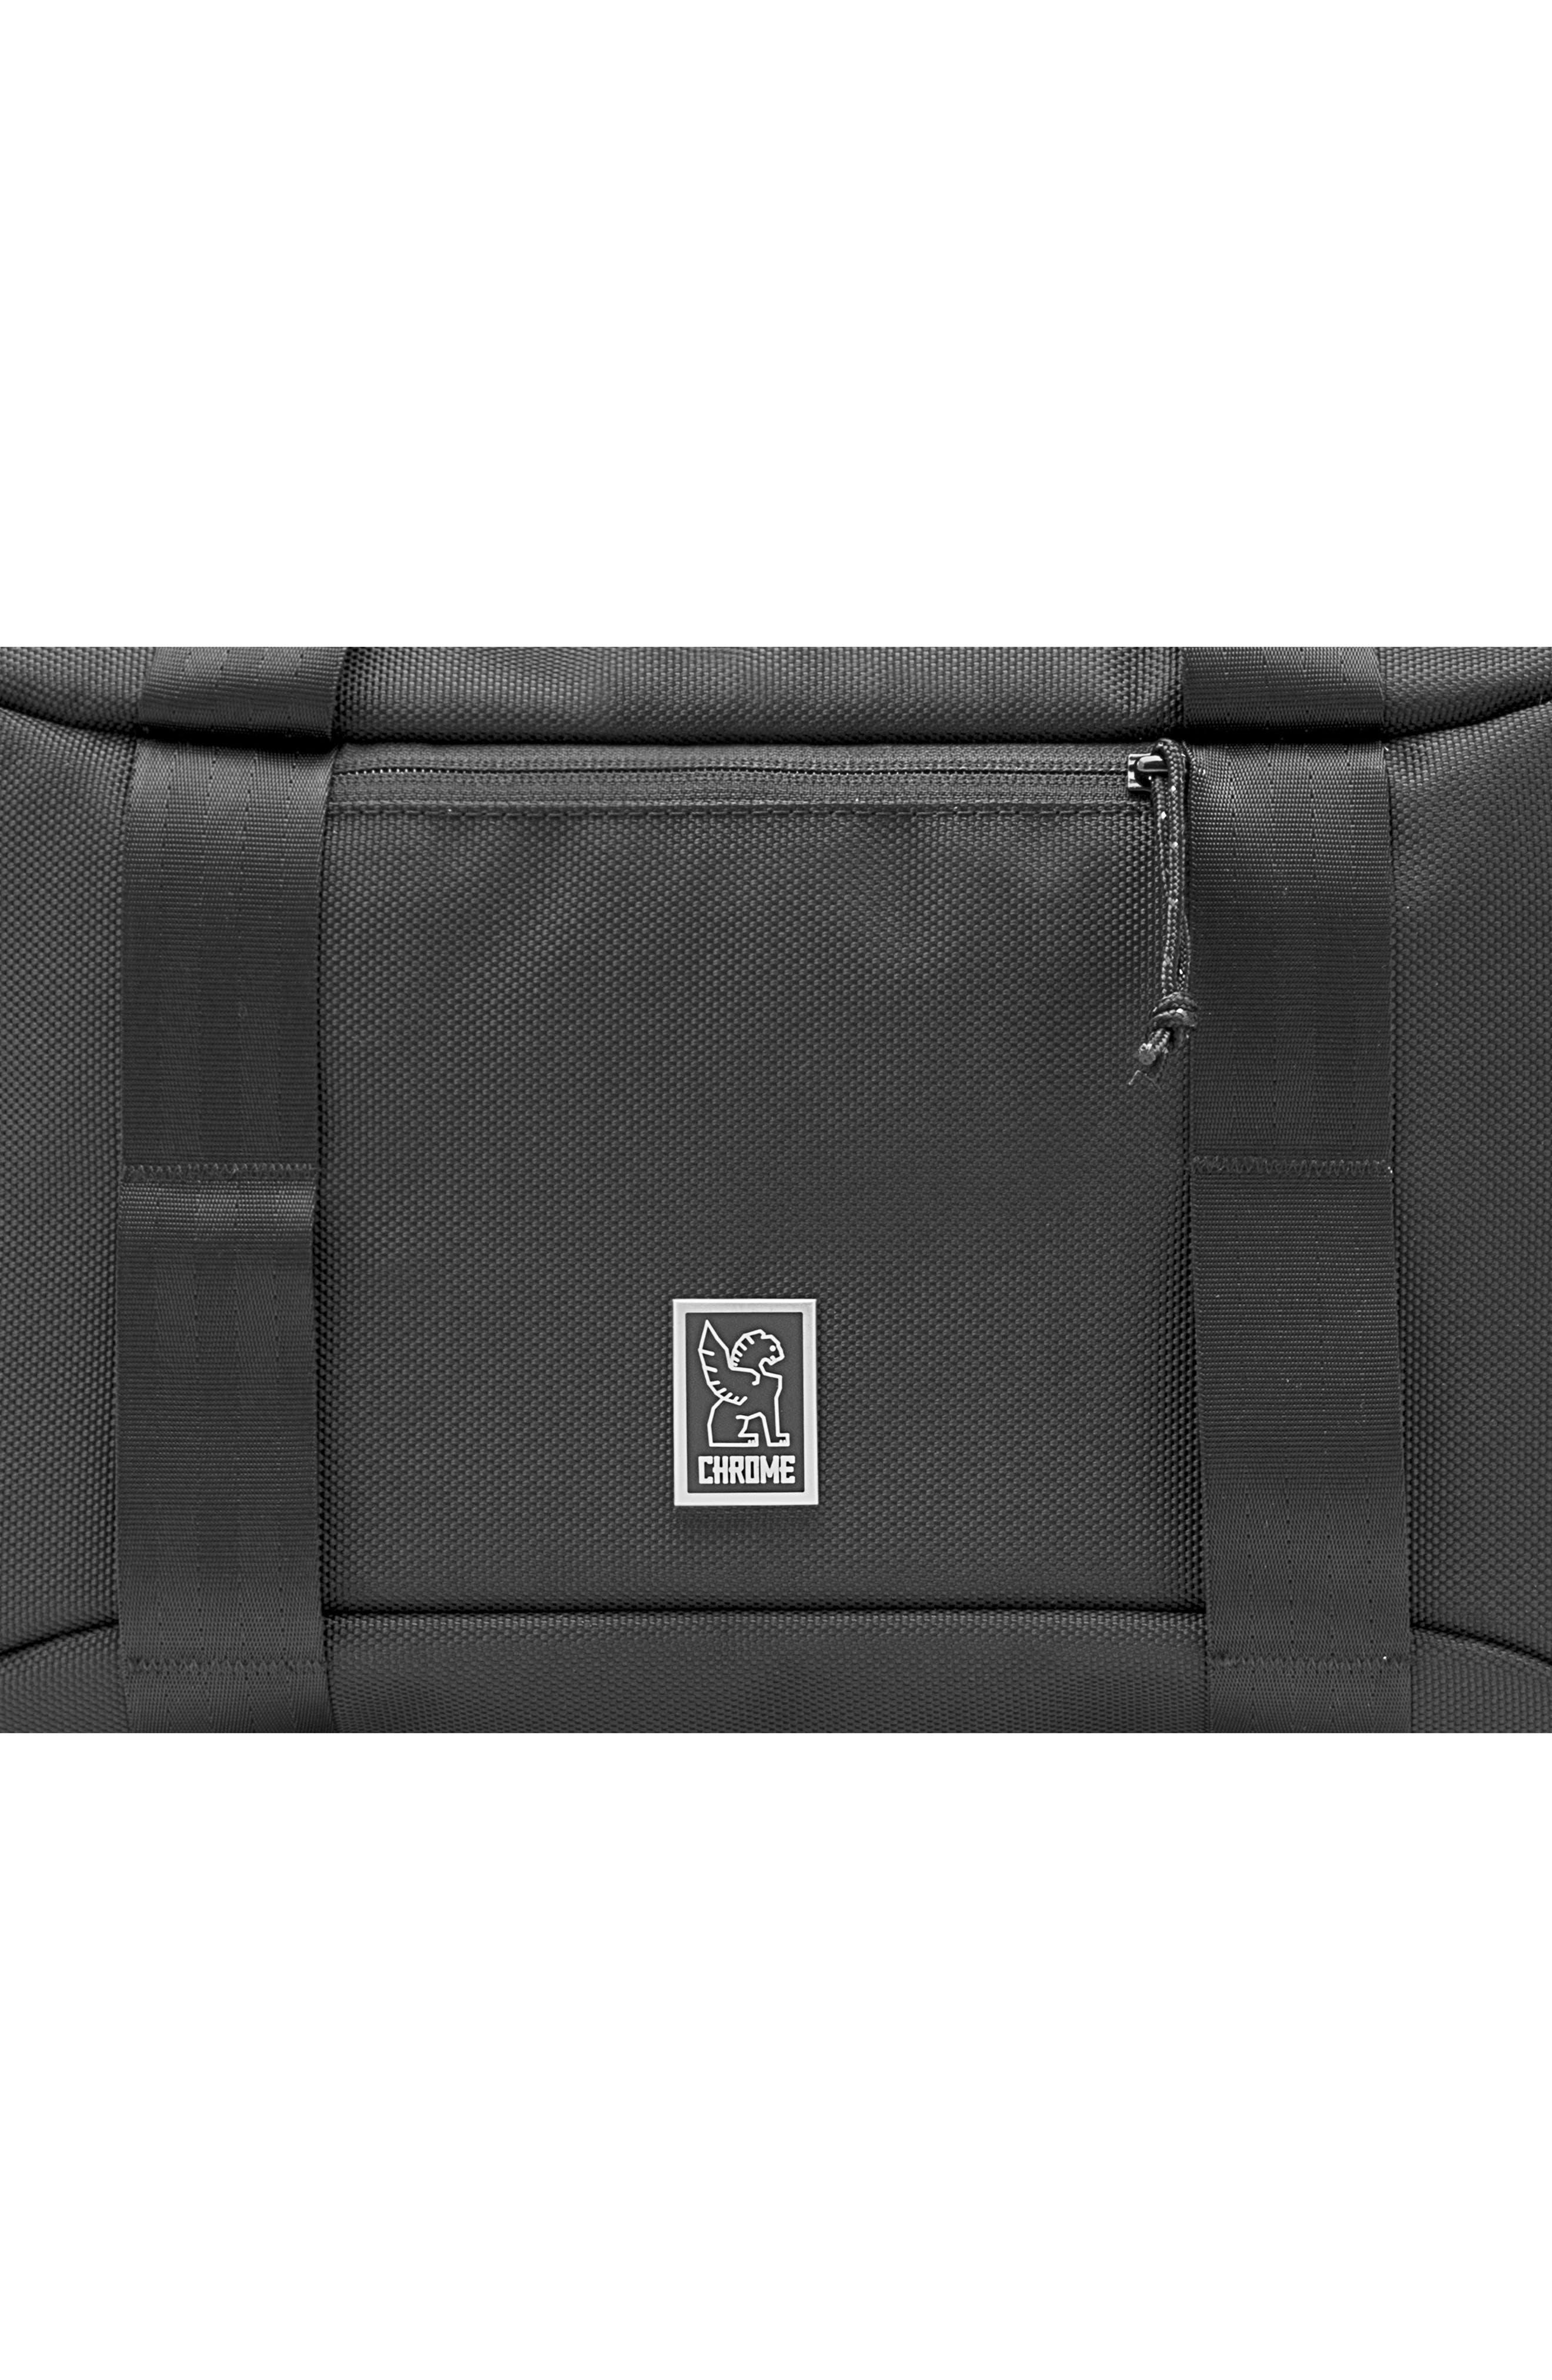 Treadwell Travel Vega Convertible Briefcase,                             Alternate thumbnail 6, color,                             All Black